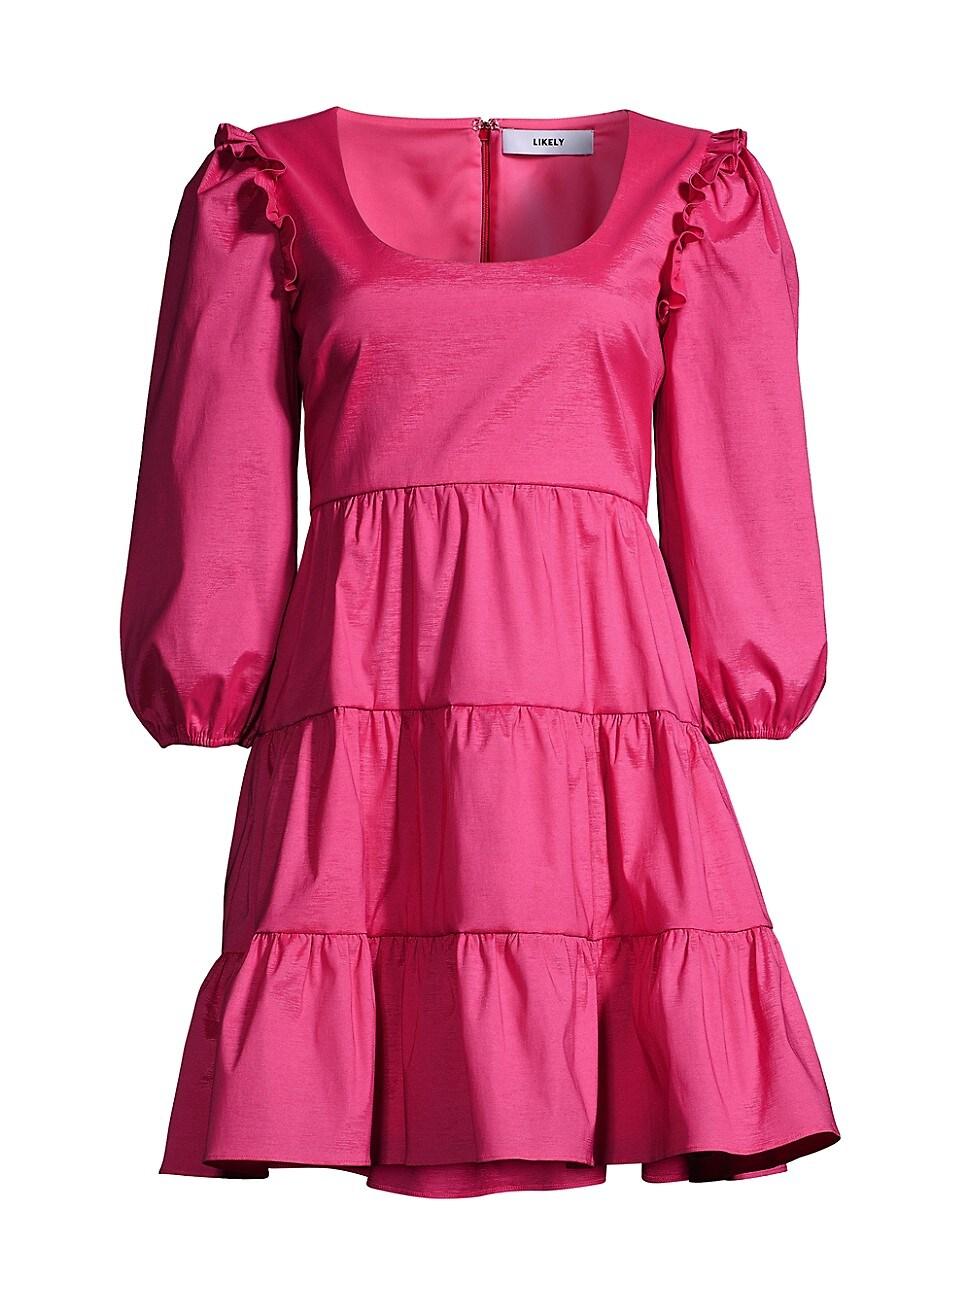 Likely WOMEN'S AVENA PUFF-SLEEVE MINI A-LINE DRESS